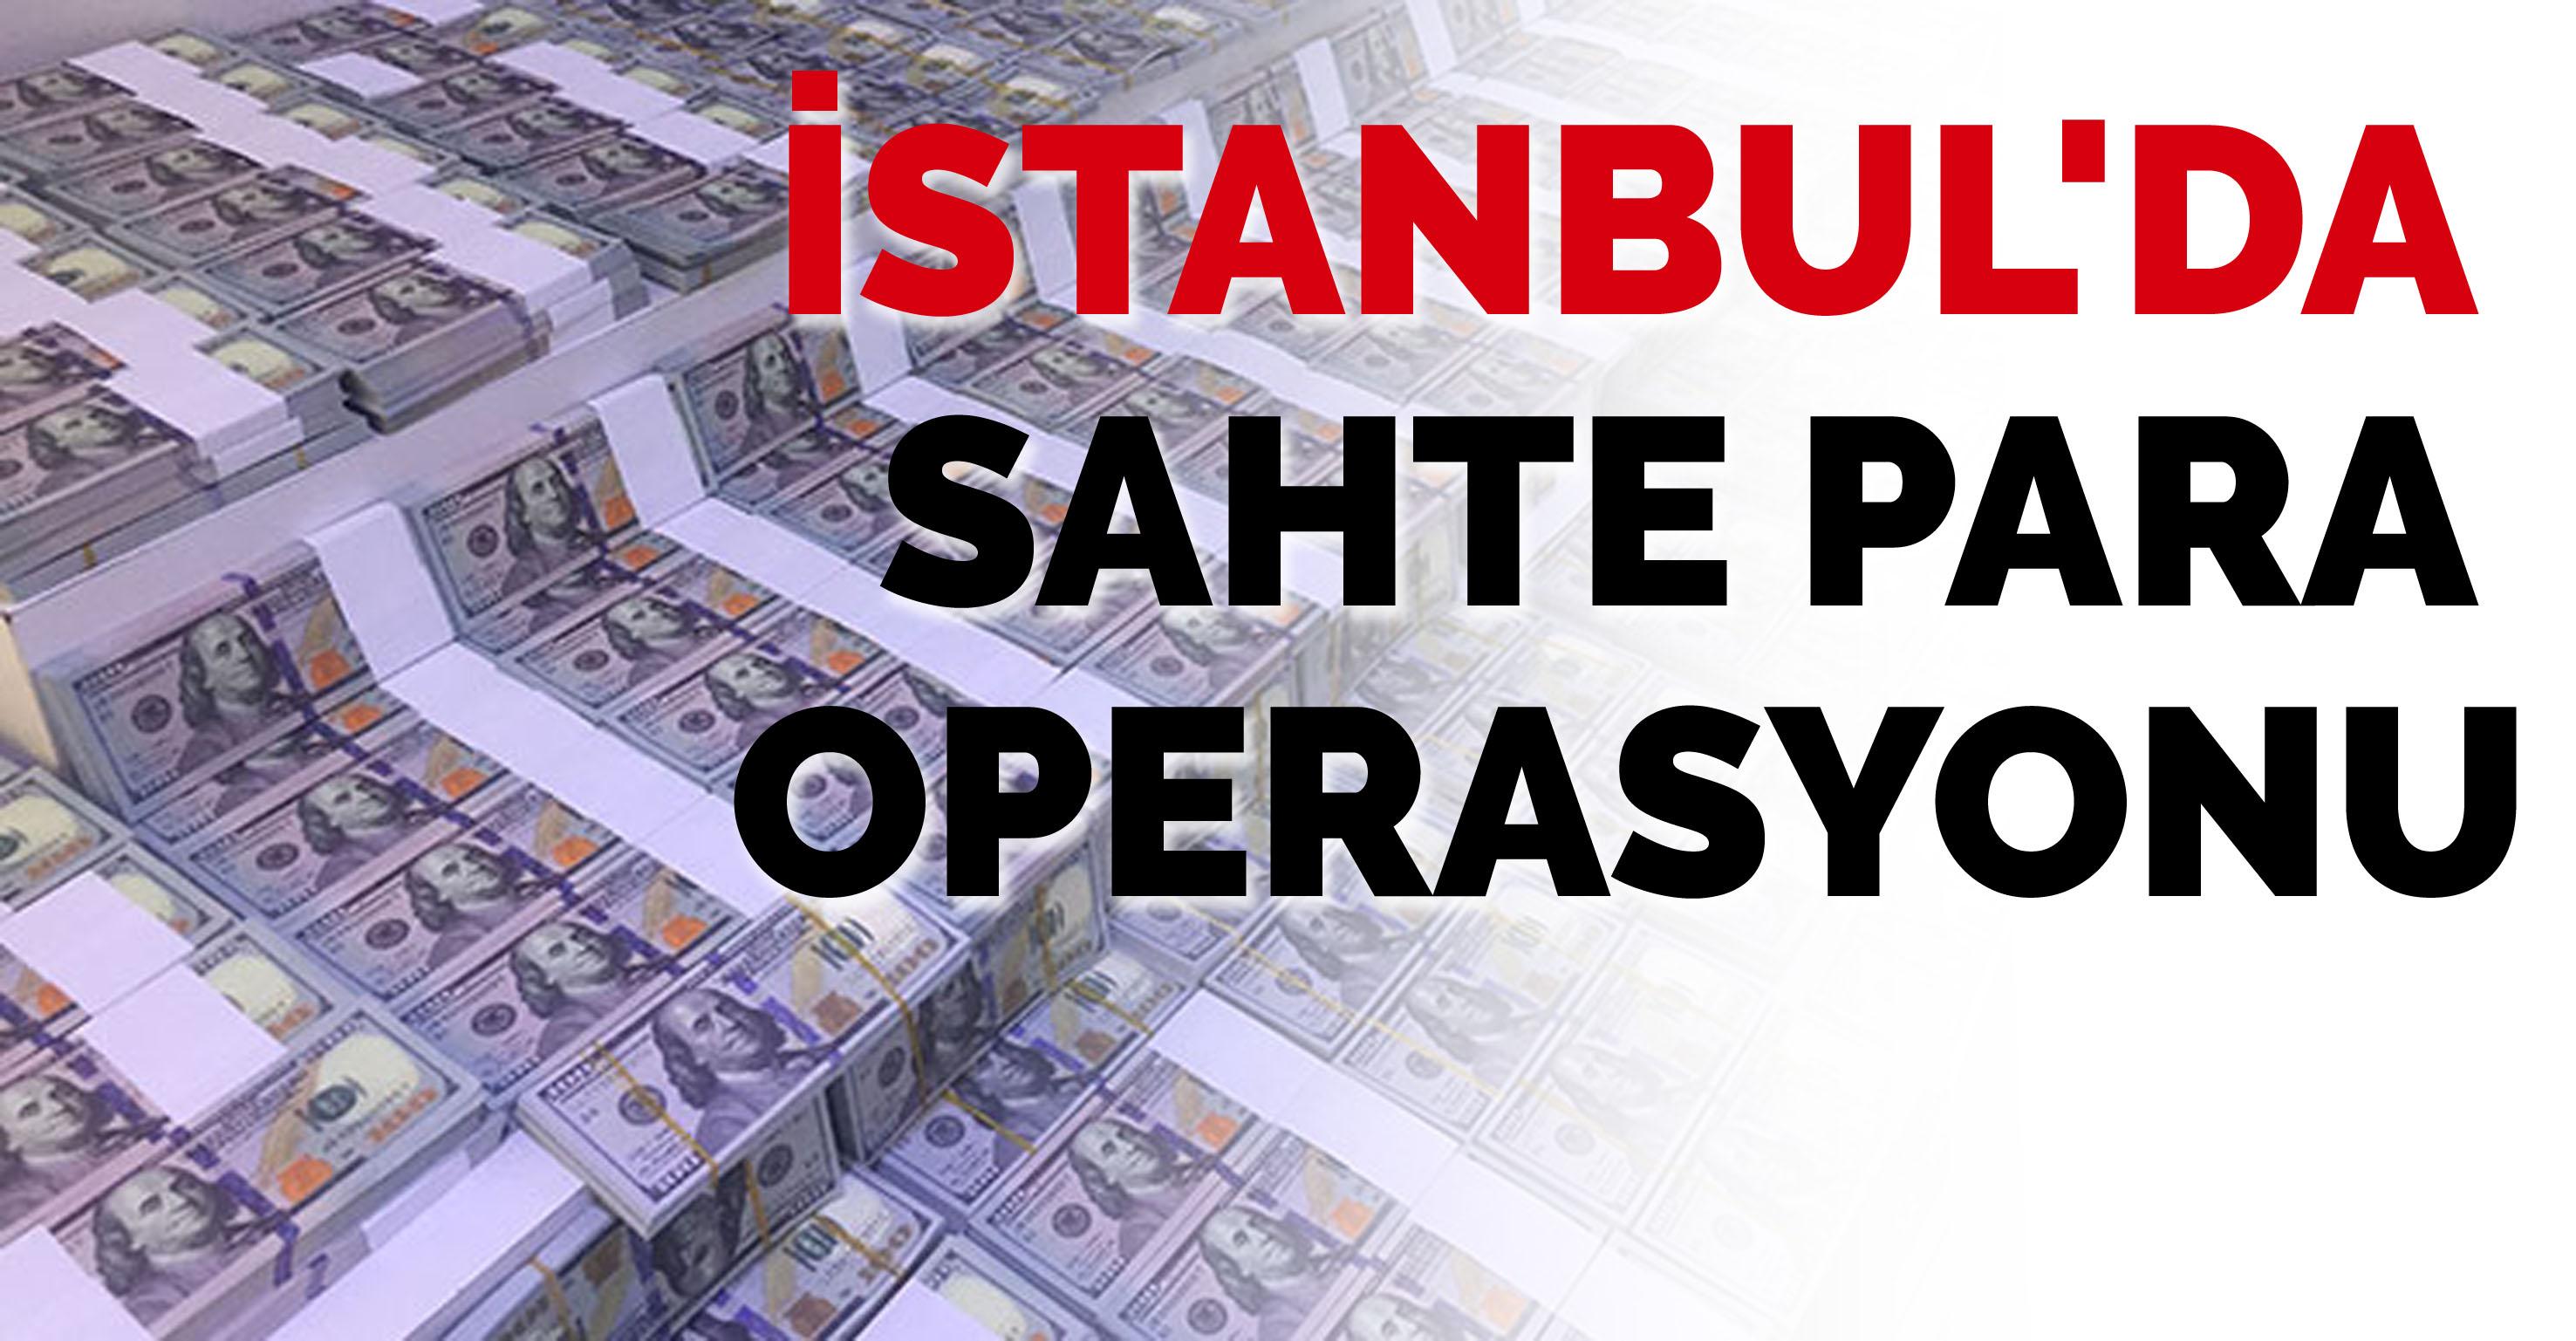 İstanbul'da sahte para operasyonu